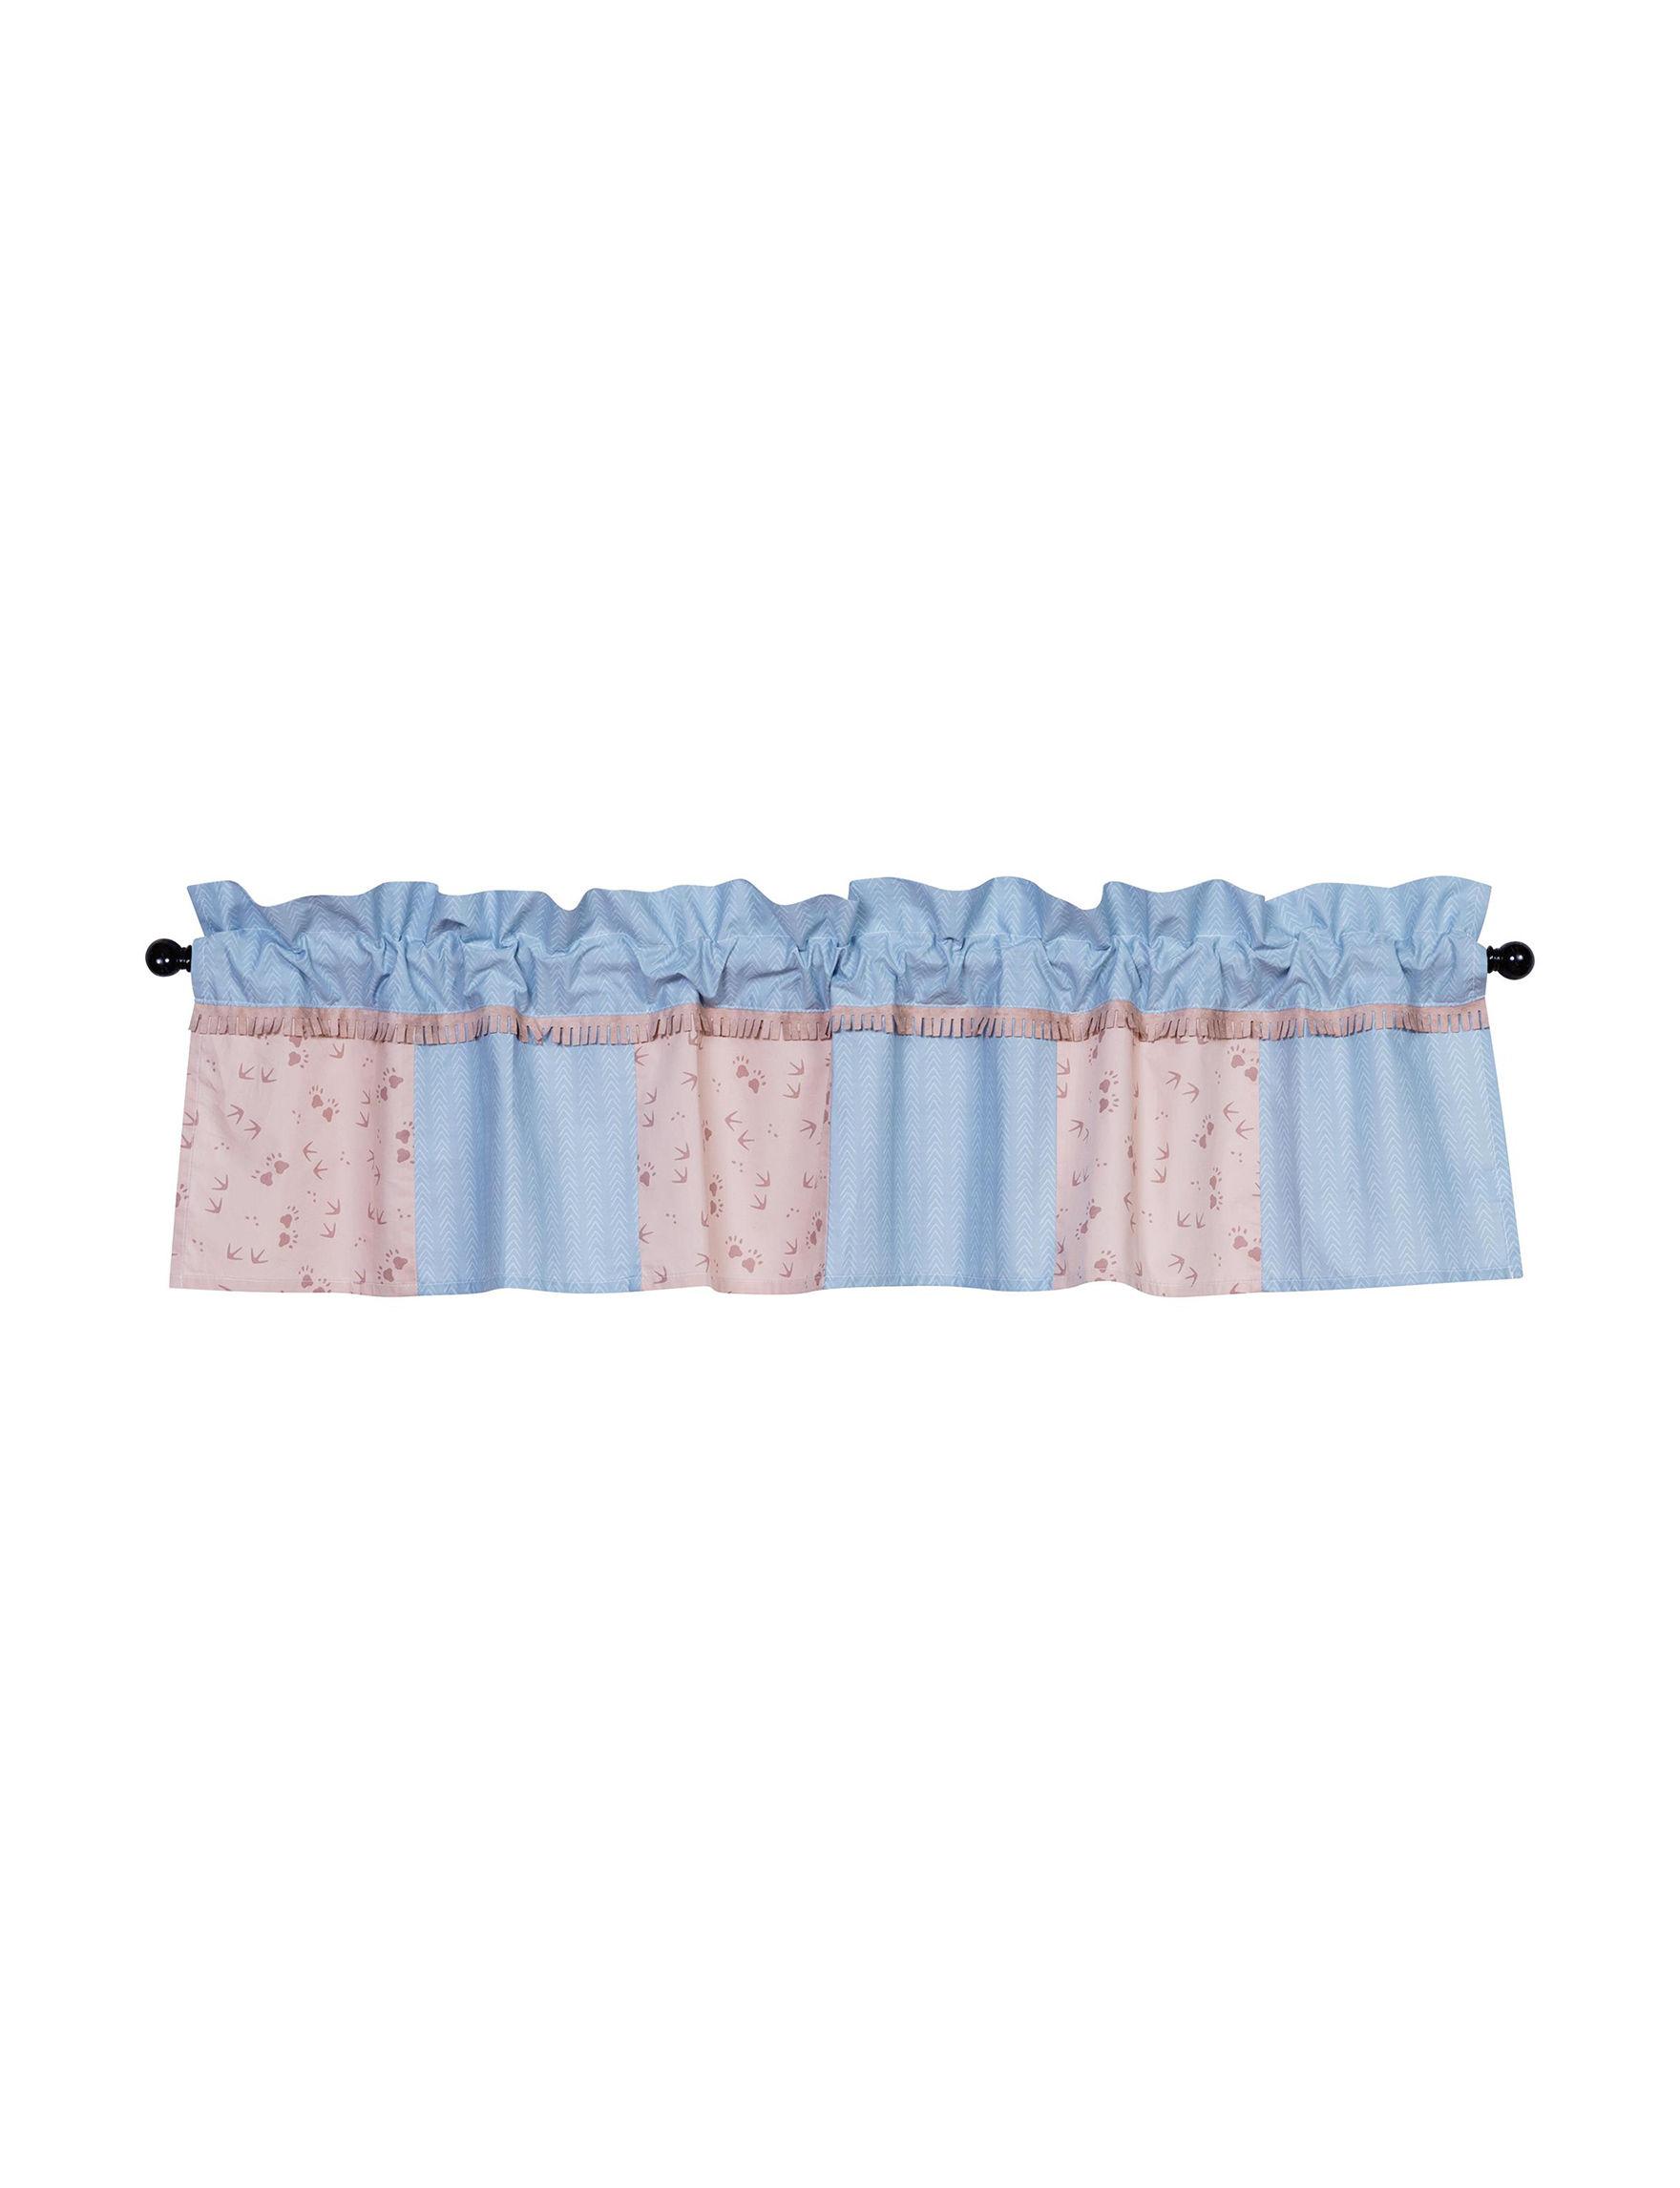 Trend Lab Brown / Blue Valances Window Treatments